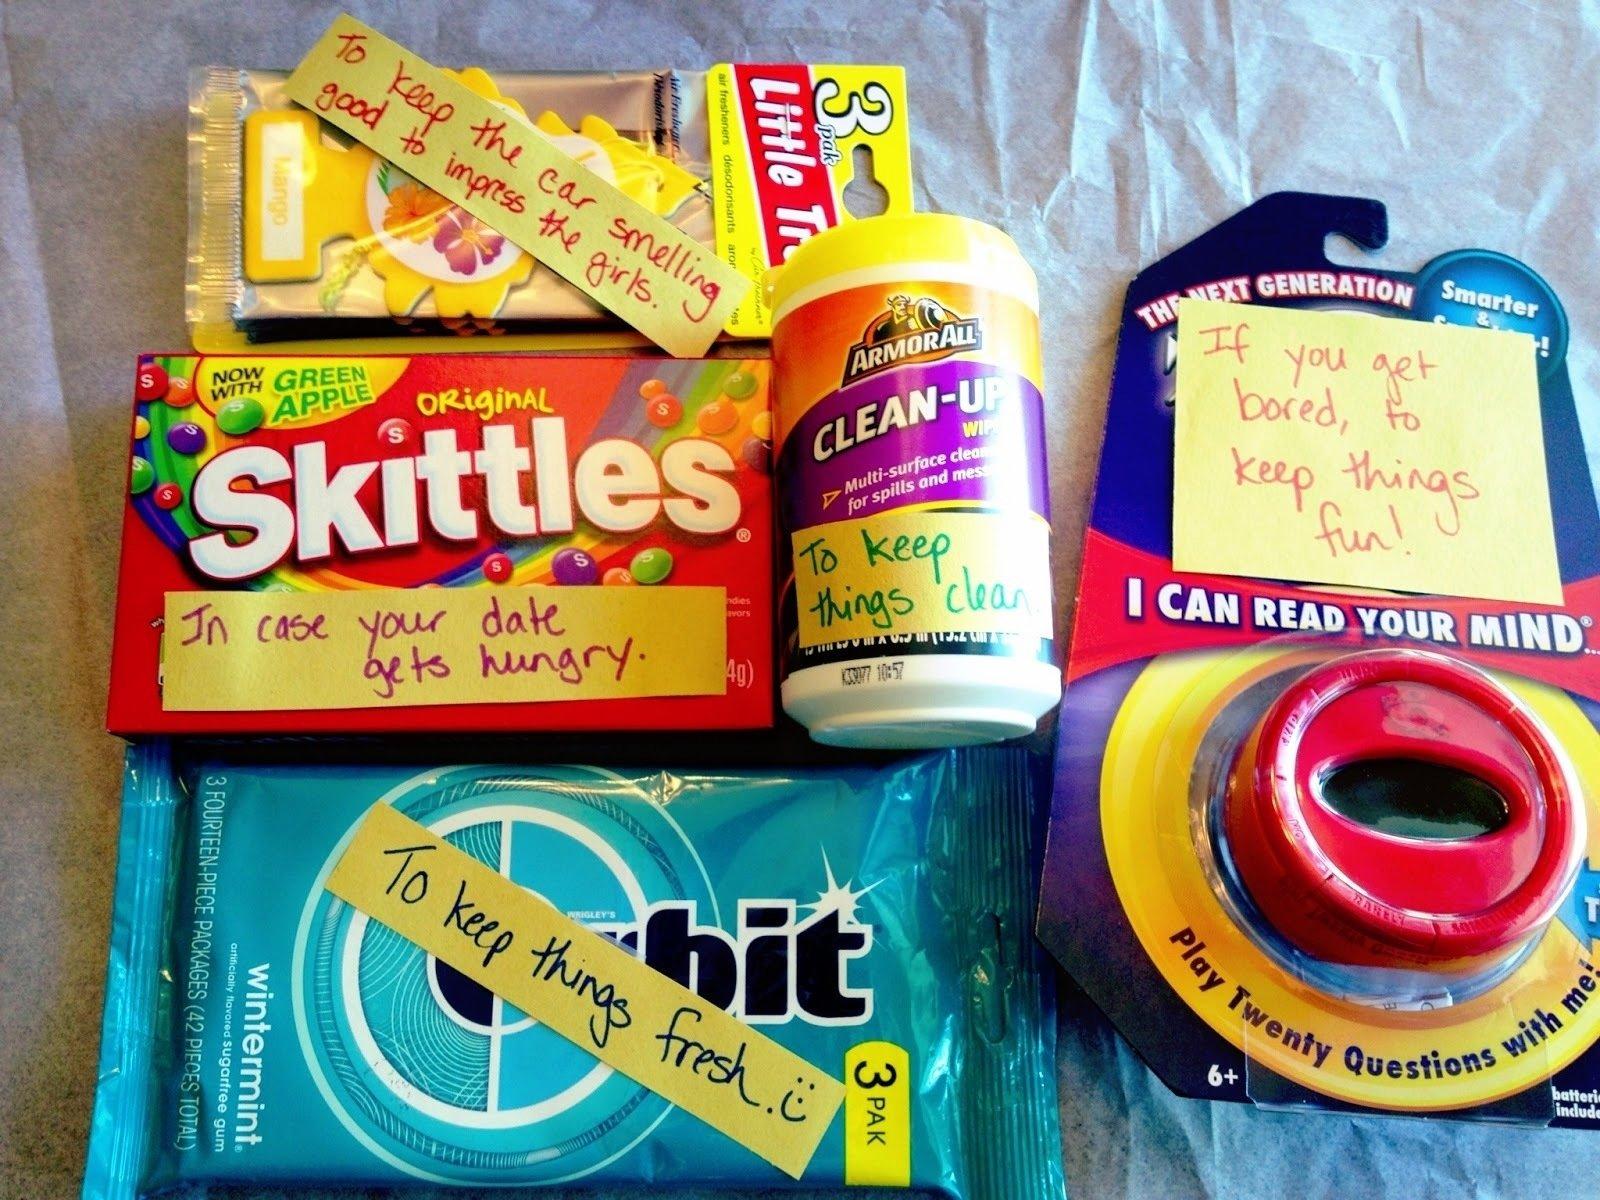 10 Nice Birthday Ideas For 16 Year Old Boy gift ideas for boyfriend gift ideas for 16 year old 16 year old boy 8 2021